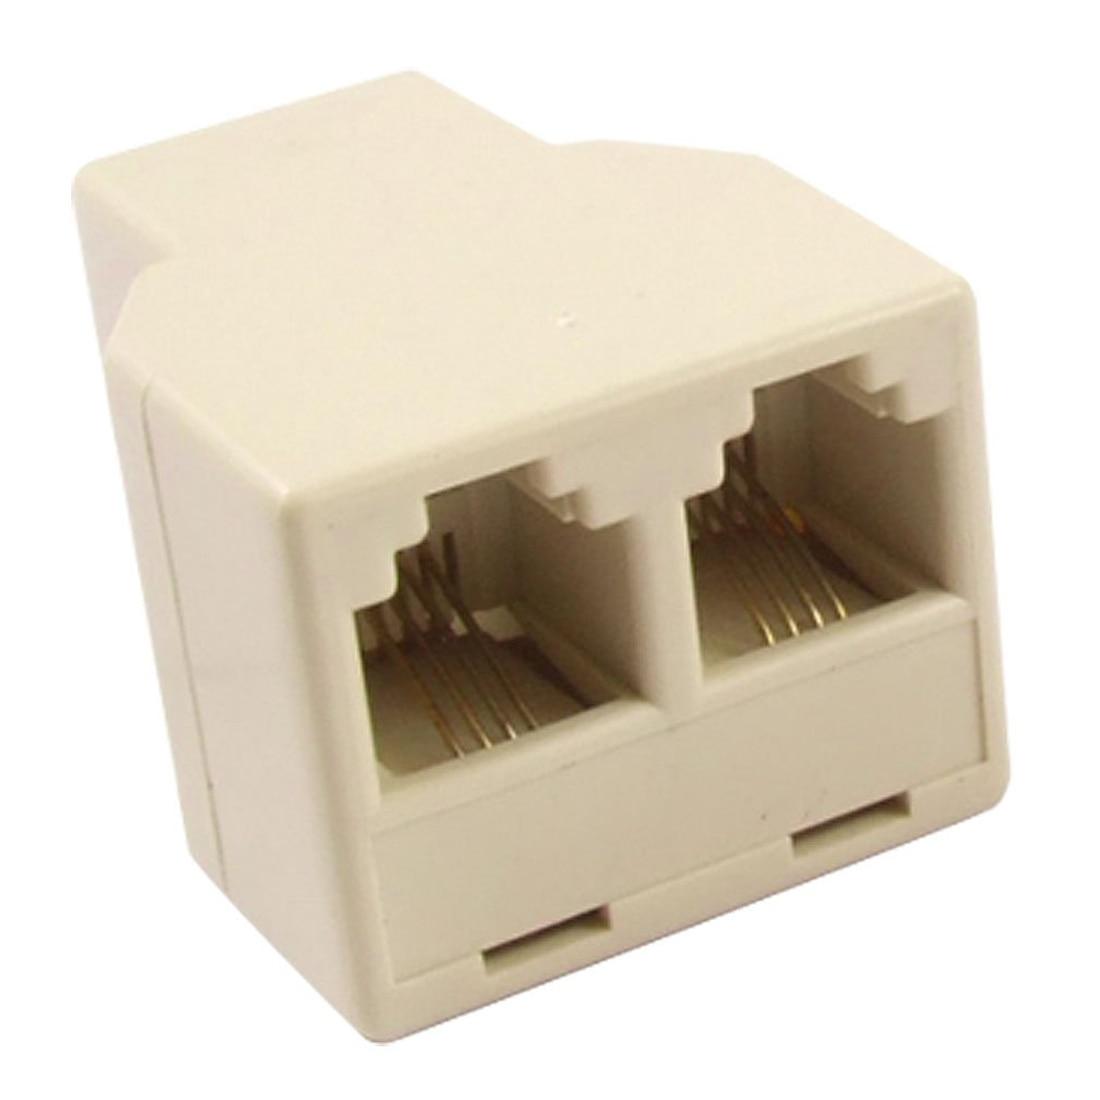 10x RJ12 6P6C Connector Sockets for Lego NXT//EV3